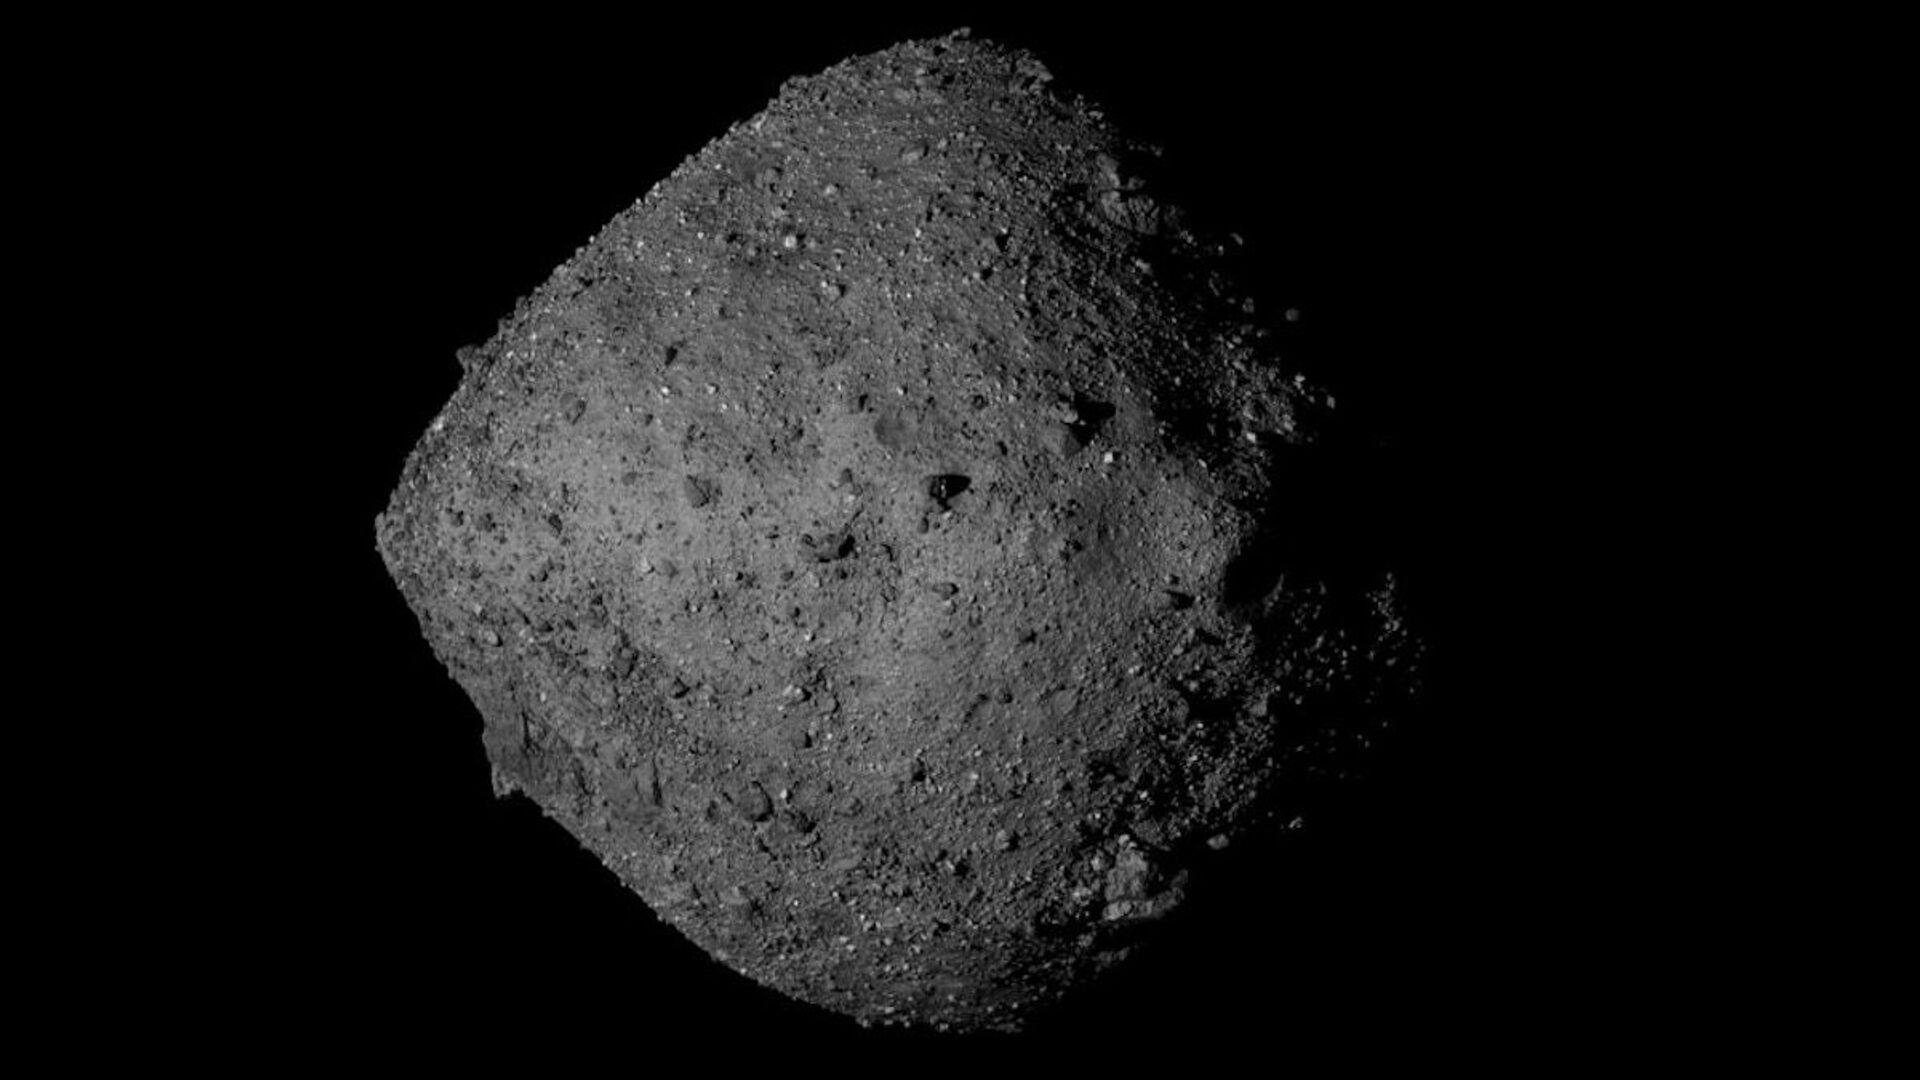 El asteroide Bennu - Sputnik Mundo, 1920, 10.07.2021